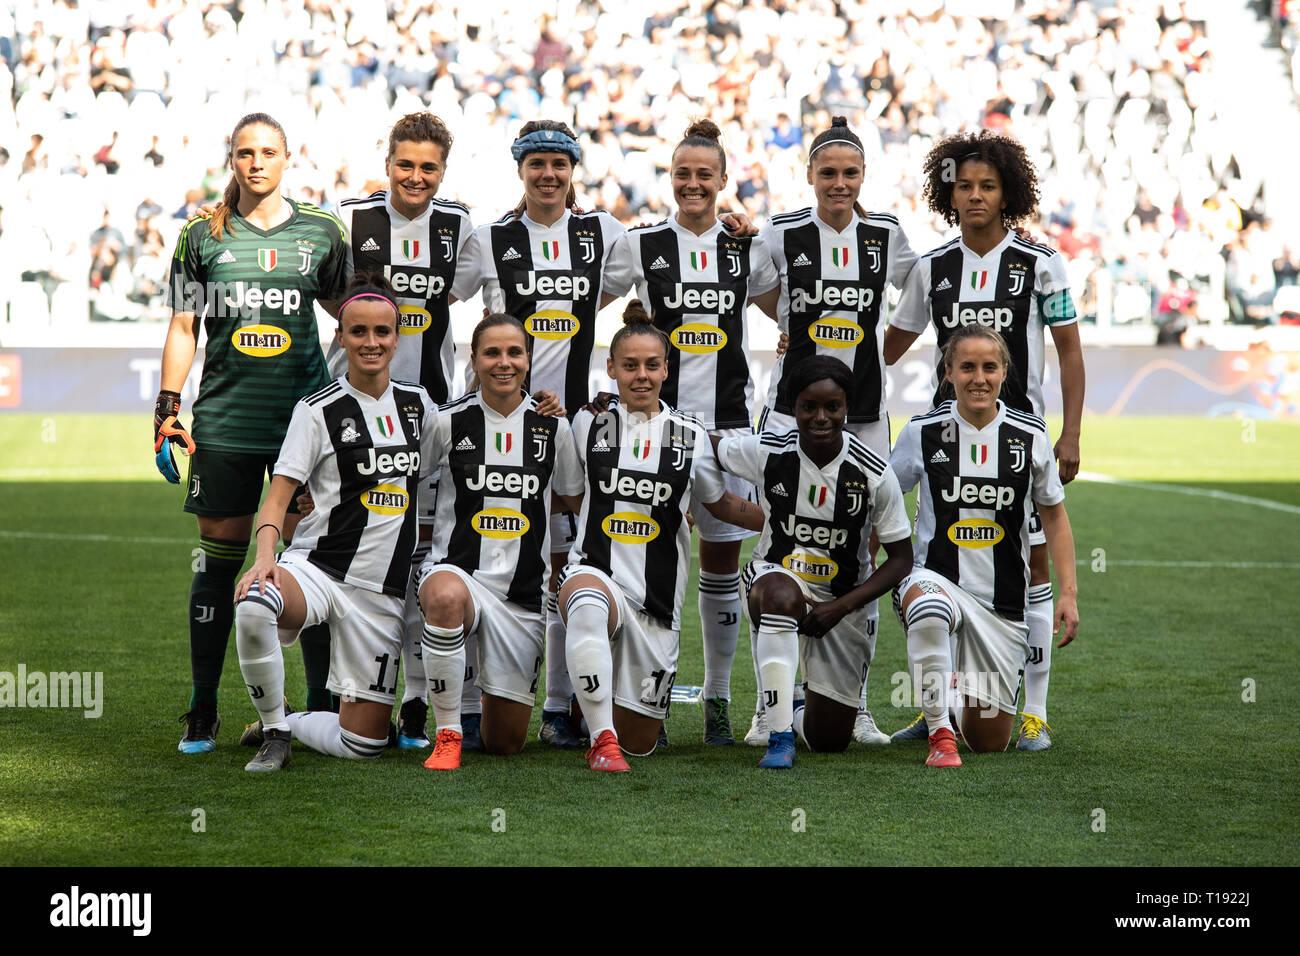 Turin Italy 24th Mar 2019 Juventus Women Team Poses Before